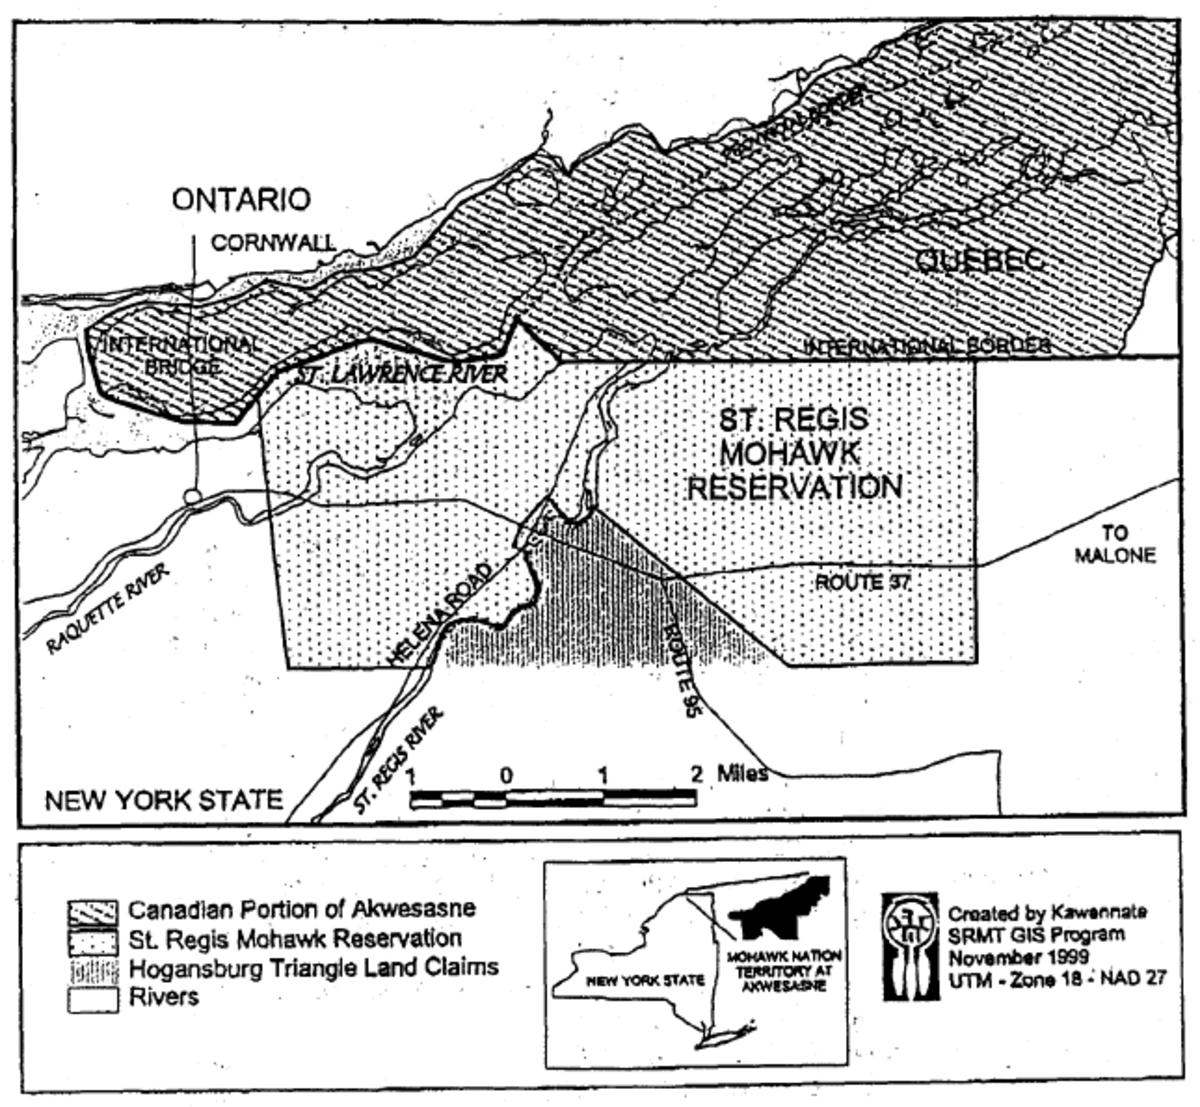 the-kahniakenhaka-mohawk-nation-council-vs-the-st-regis-council-of-akwesasne-mohawk